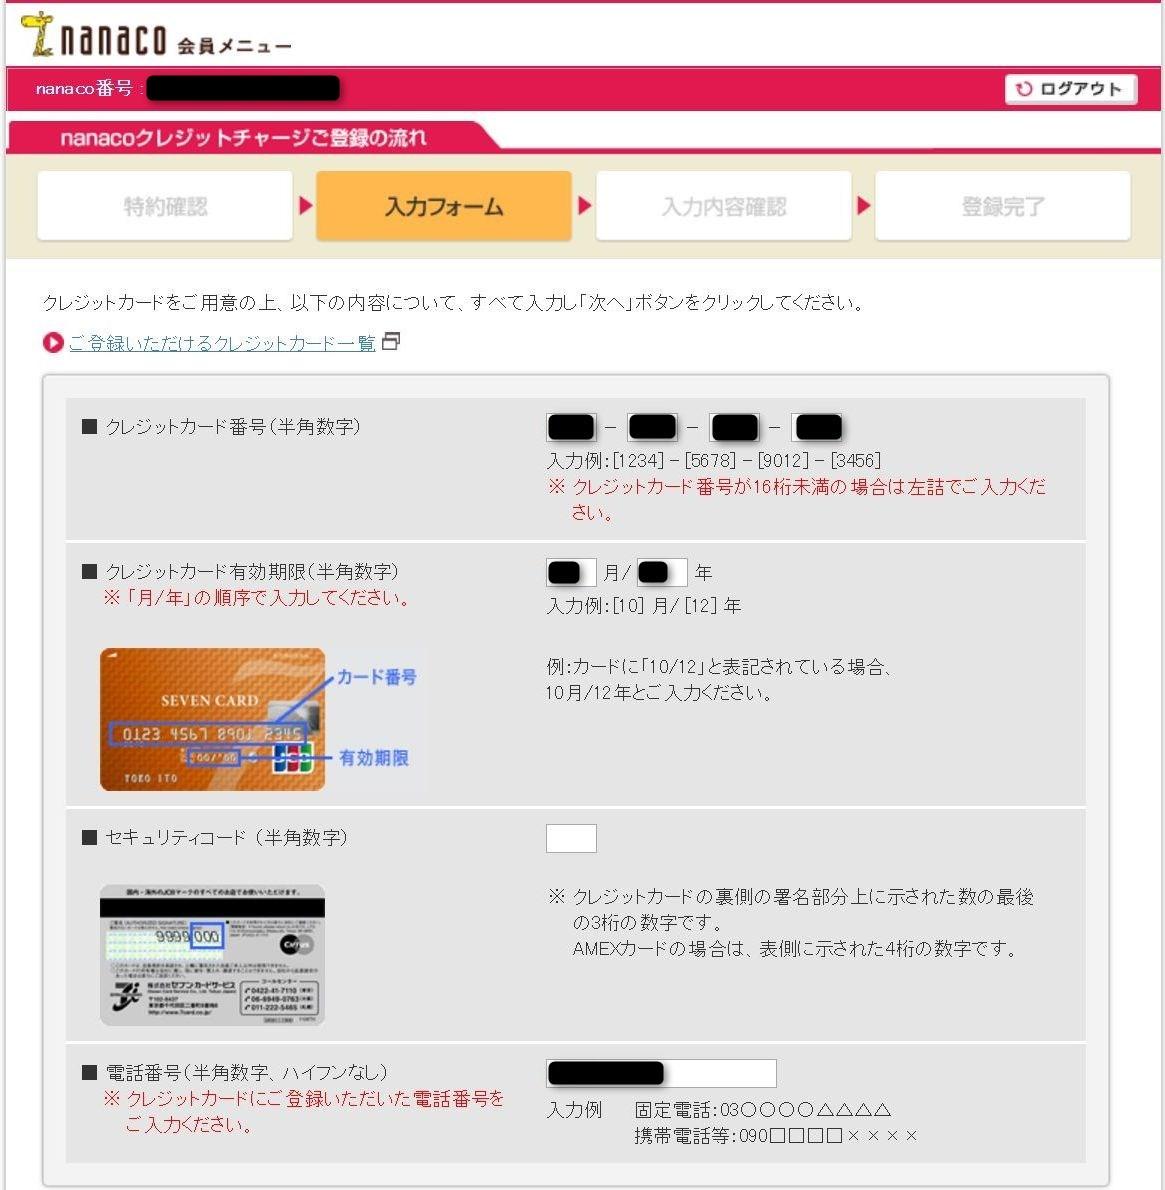 nanacoクレジットチャージの入力フォーム1